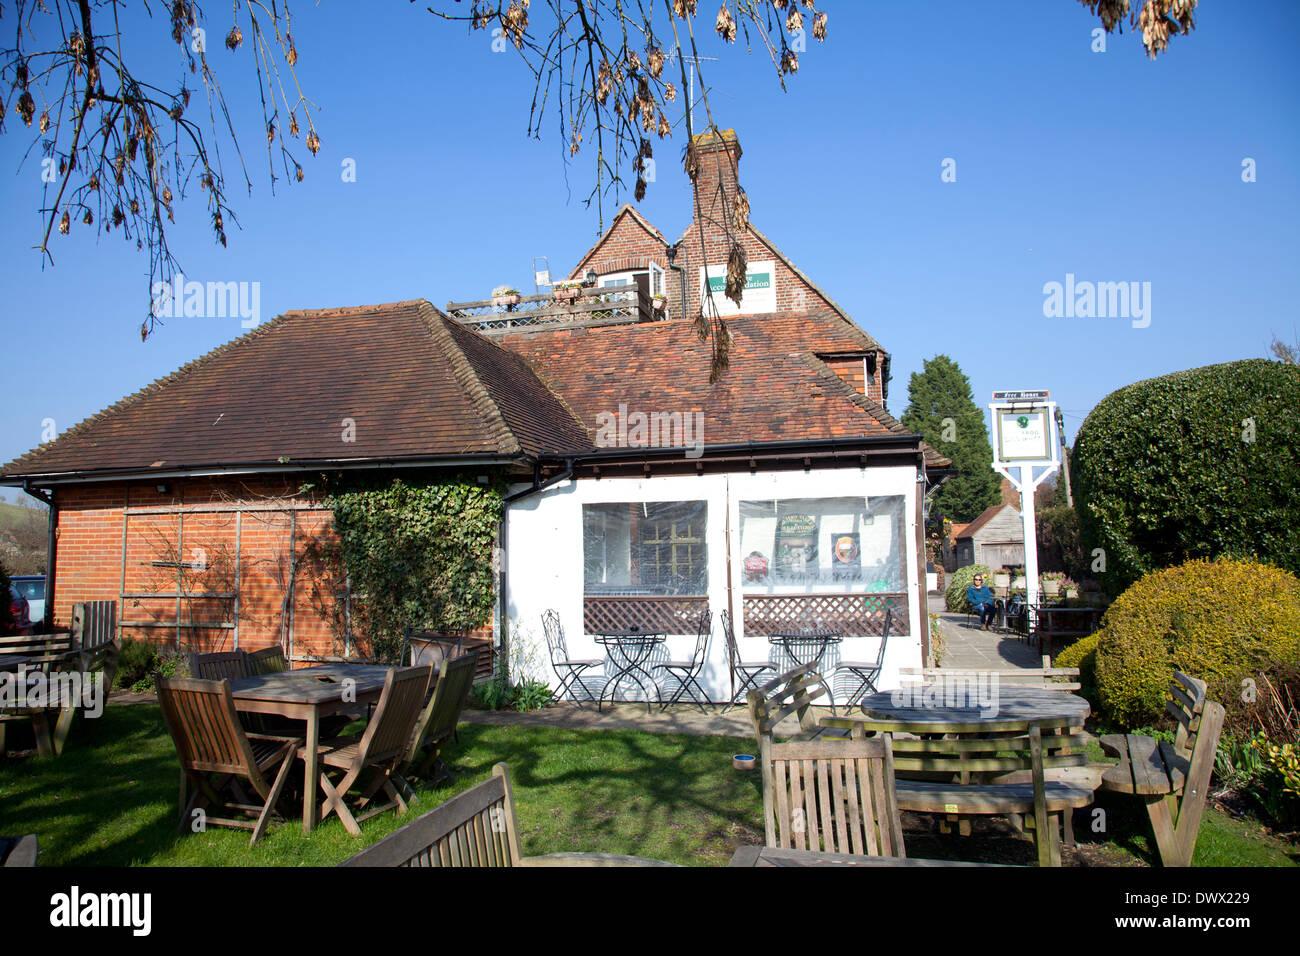 The Frog Pub and Restaurant in Skirmett in Buckinghamshire - UK Stock Photo